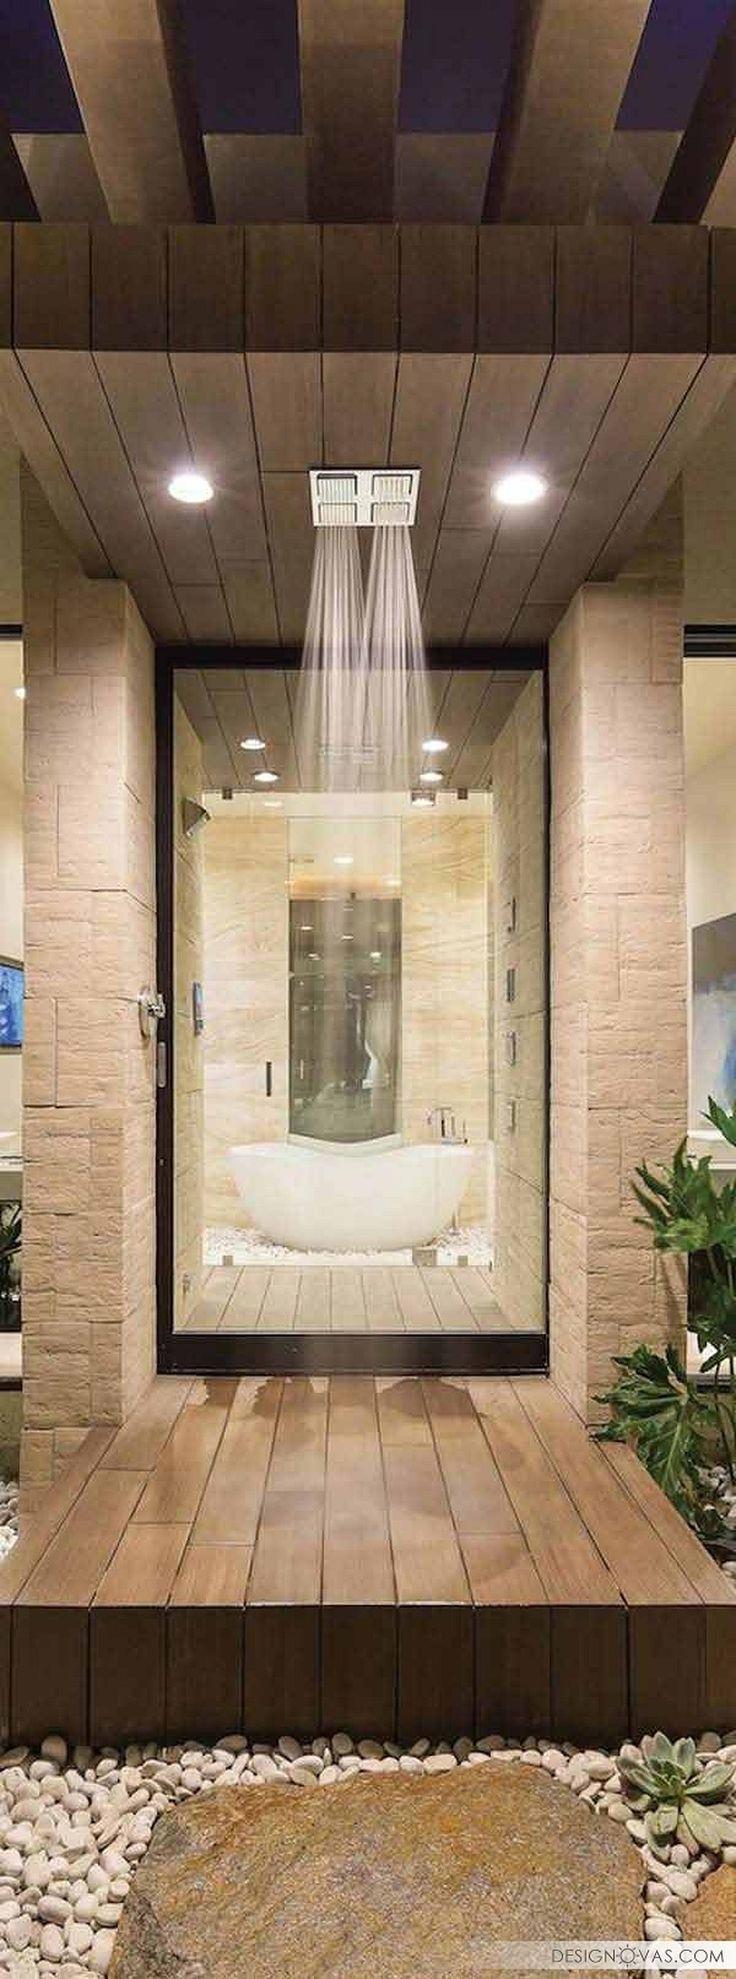 Bathroom rain showers - The 25 Best Rain Shower Bathroom Ideas On Pinterest Amazing Bathrooms Rain Shower And Waterfall Shower